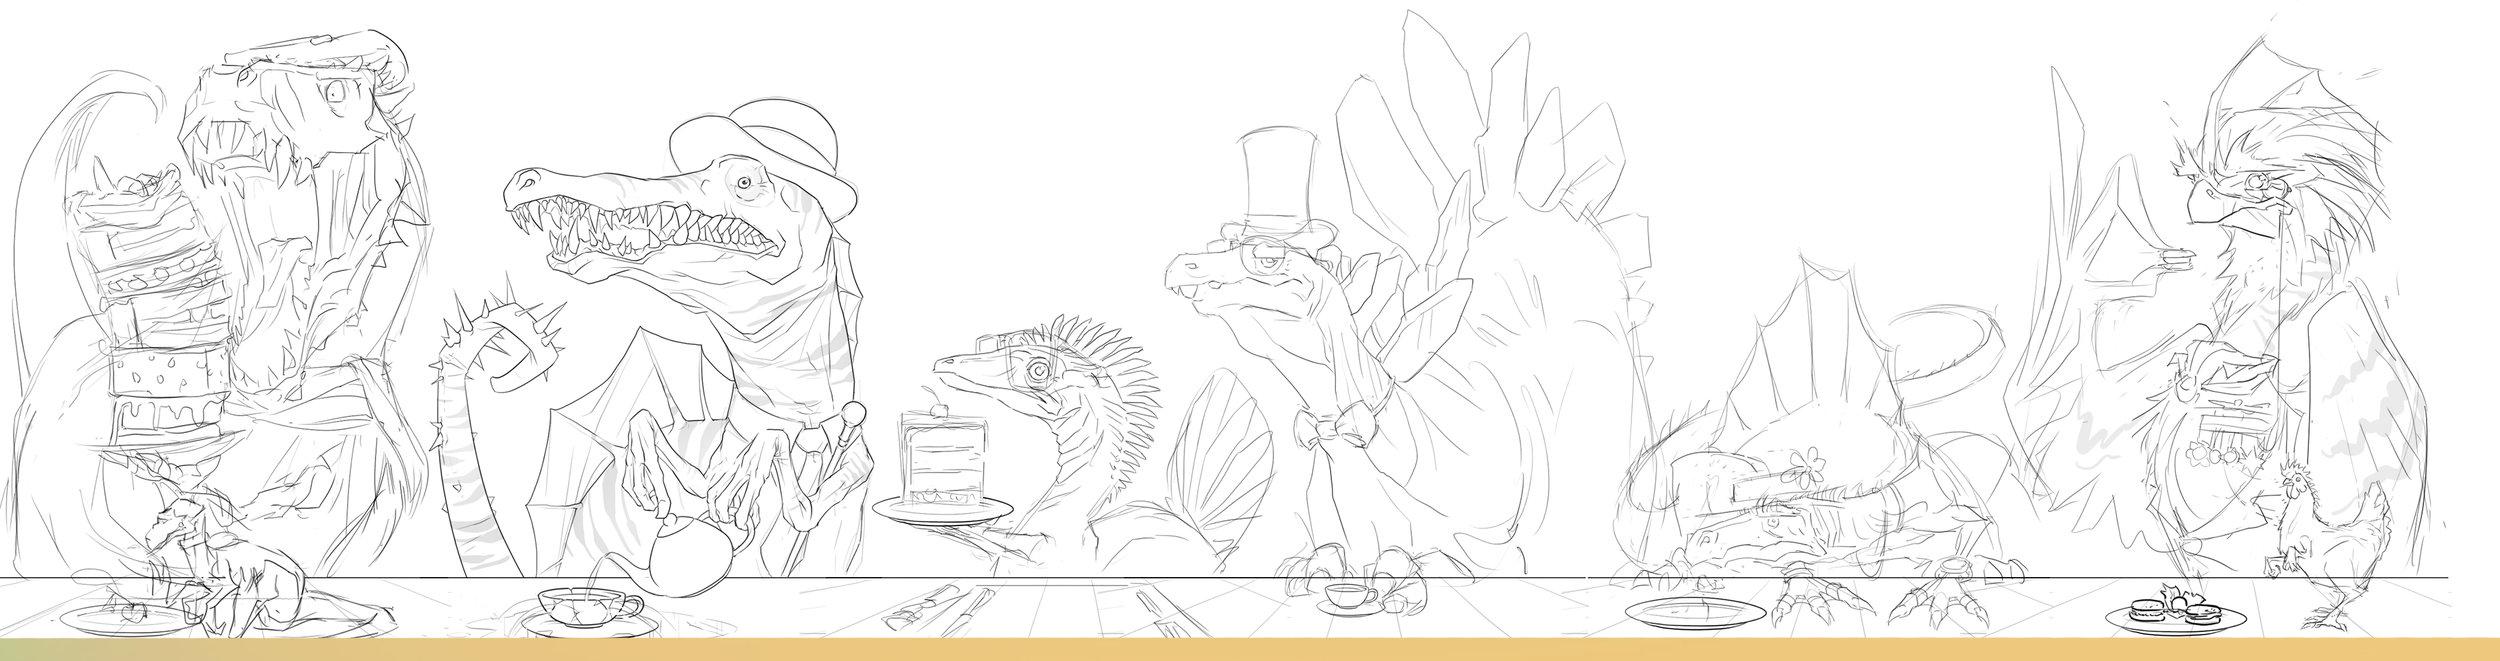 Sketch art for Dino Tea Party